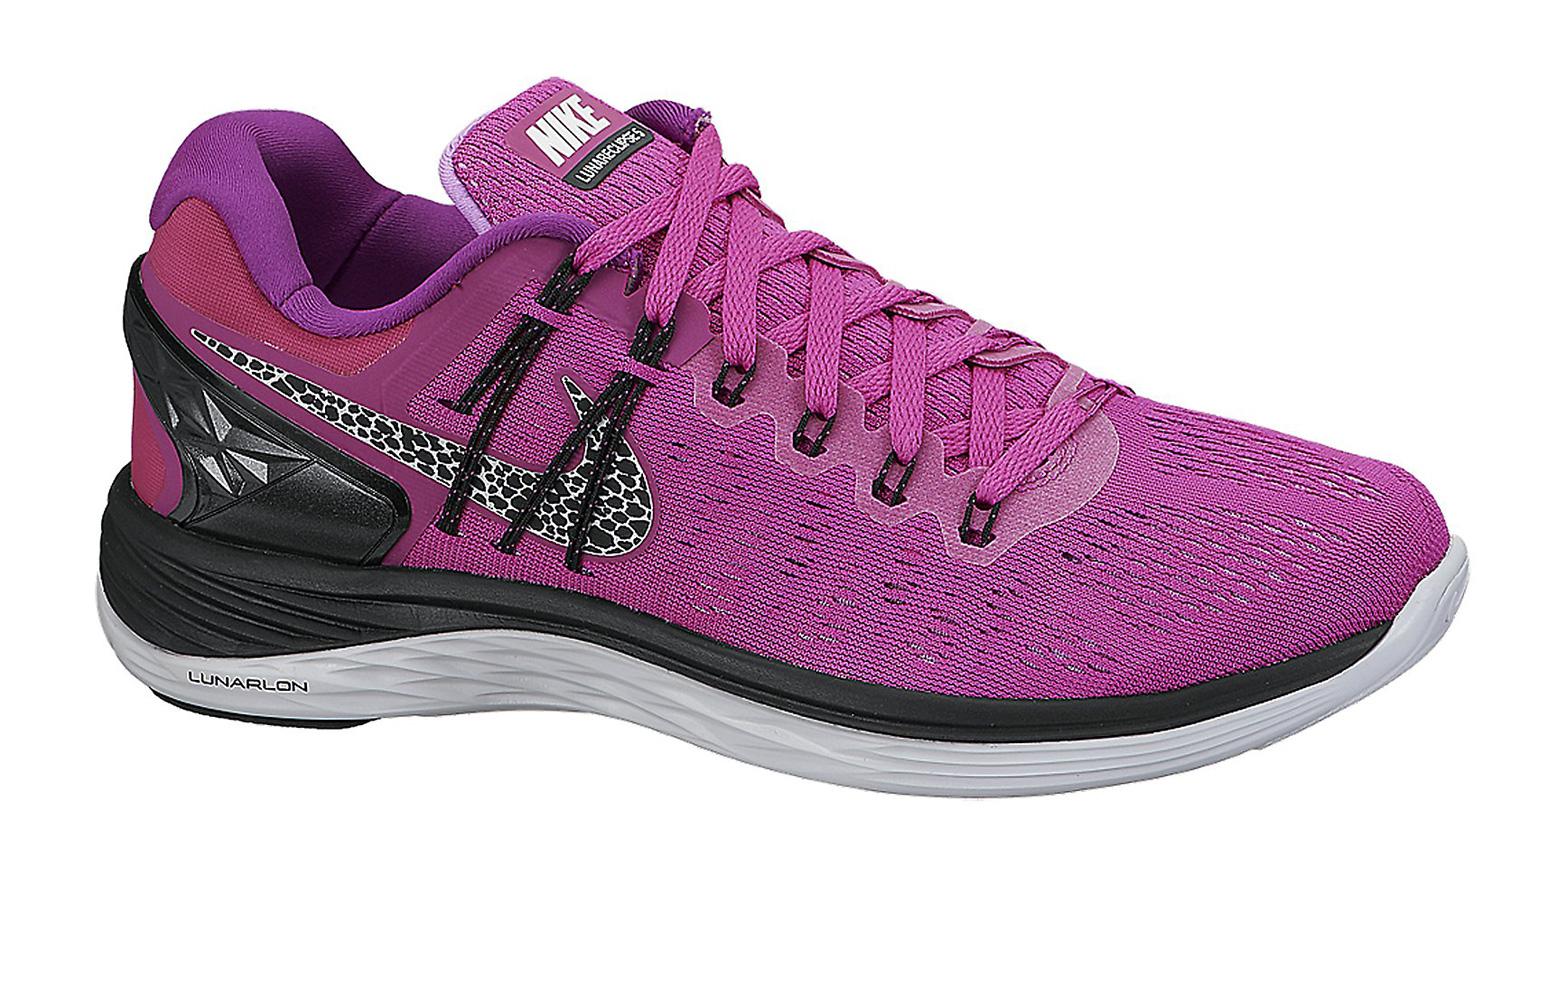 info for 3fd09 38c3b Zapatillas Nike LUNARECLIPSE 5 para Mujer Púrpura